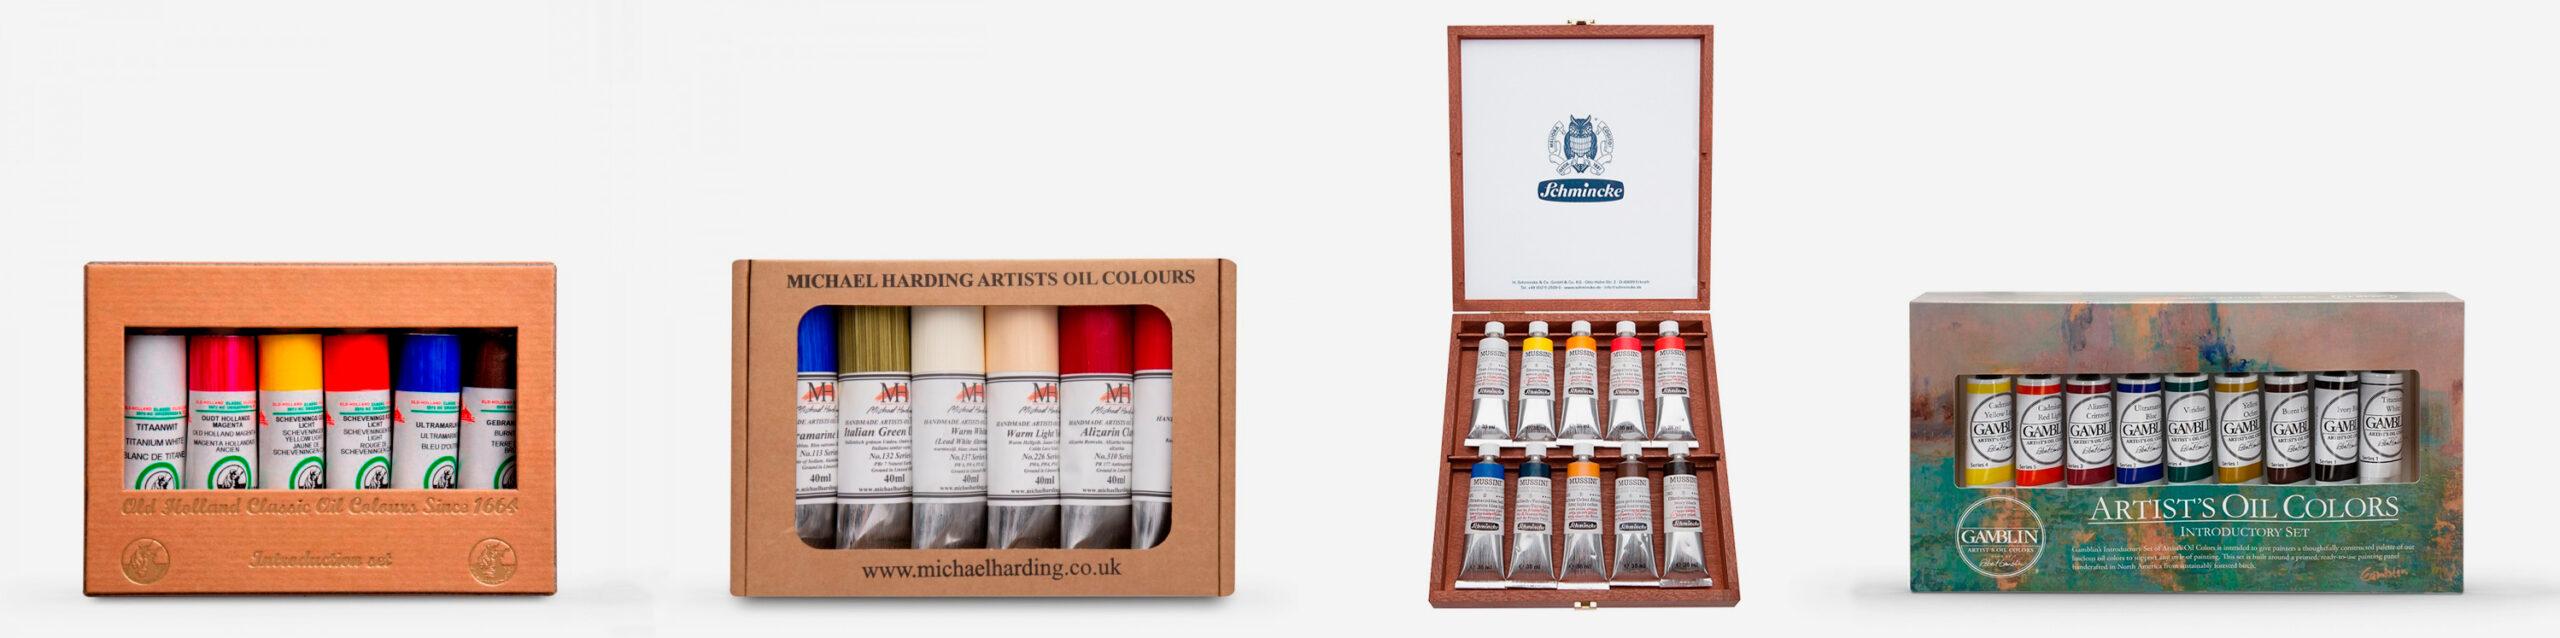 Old Holland Classic Oils Introductory set, Michael Harding Modern Master set, Schmincke Mussini Wood Box set, Gamblin Artist Oils Introductory Set